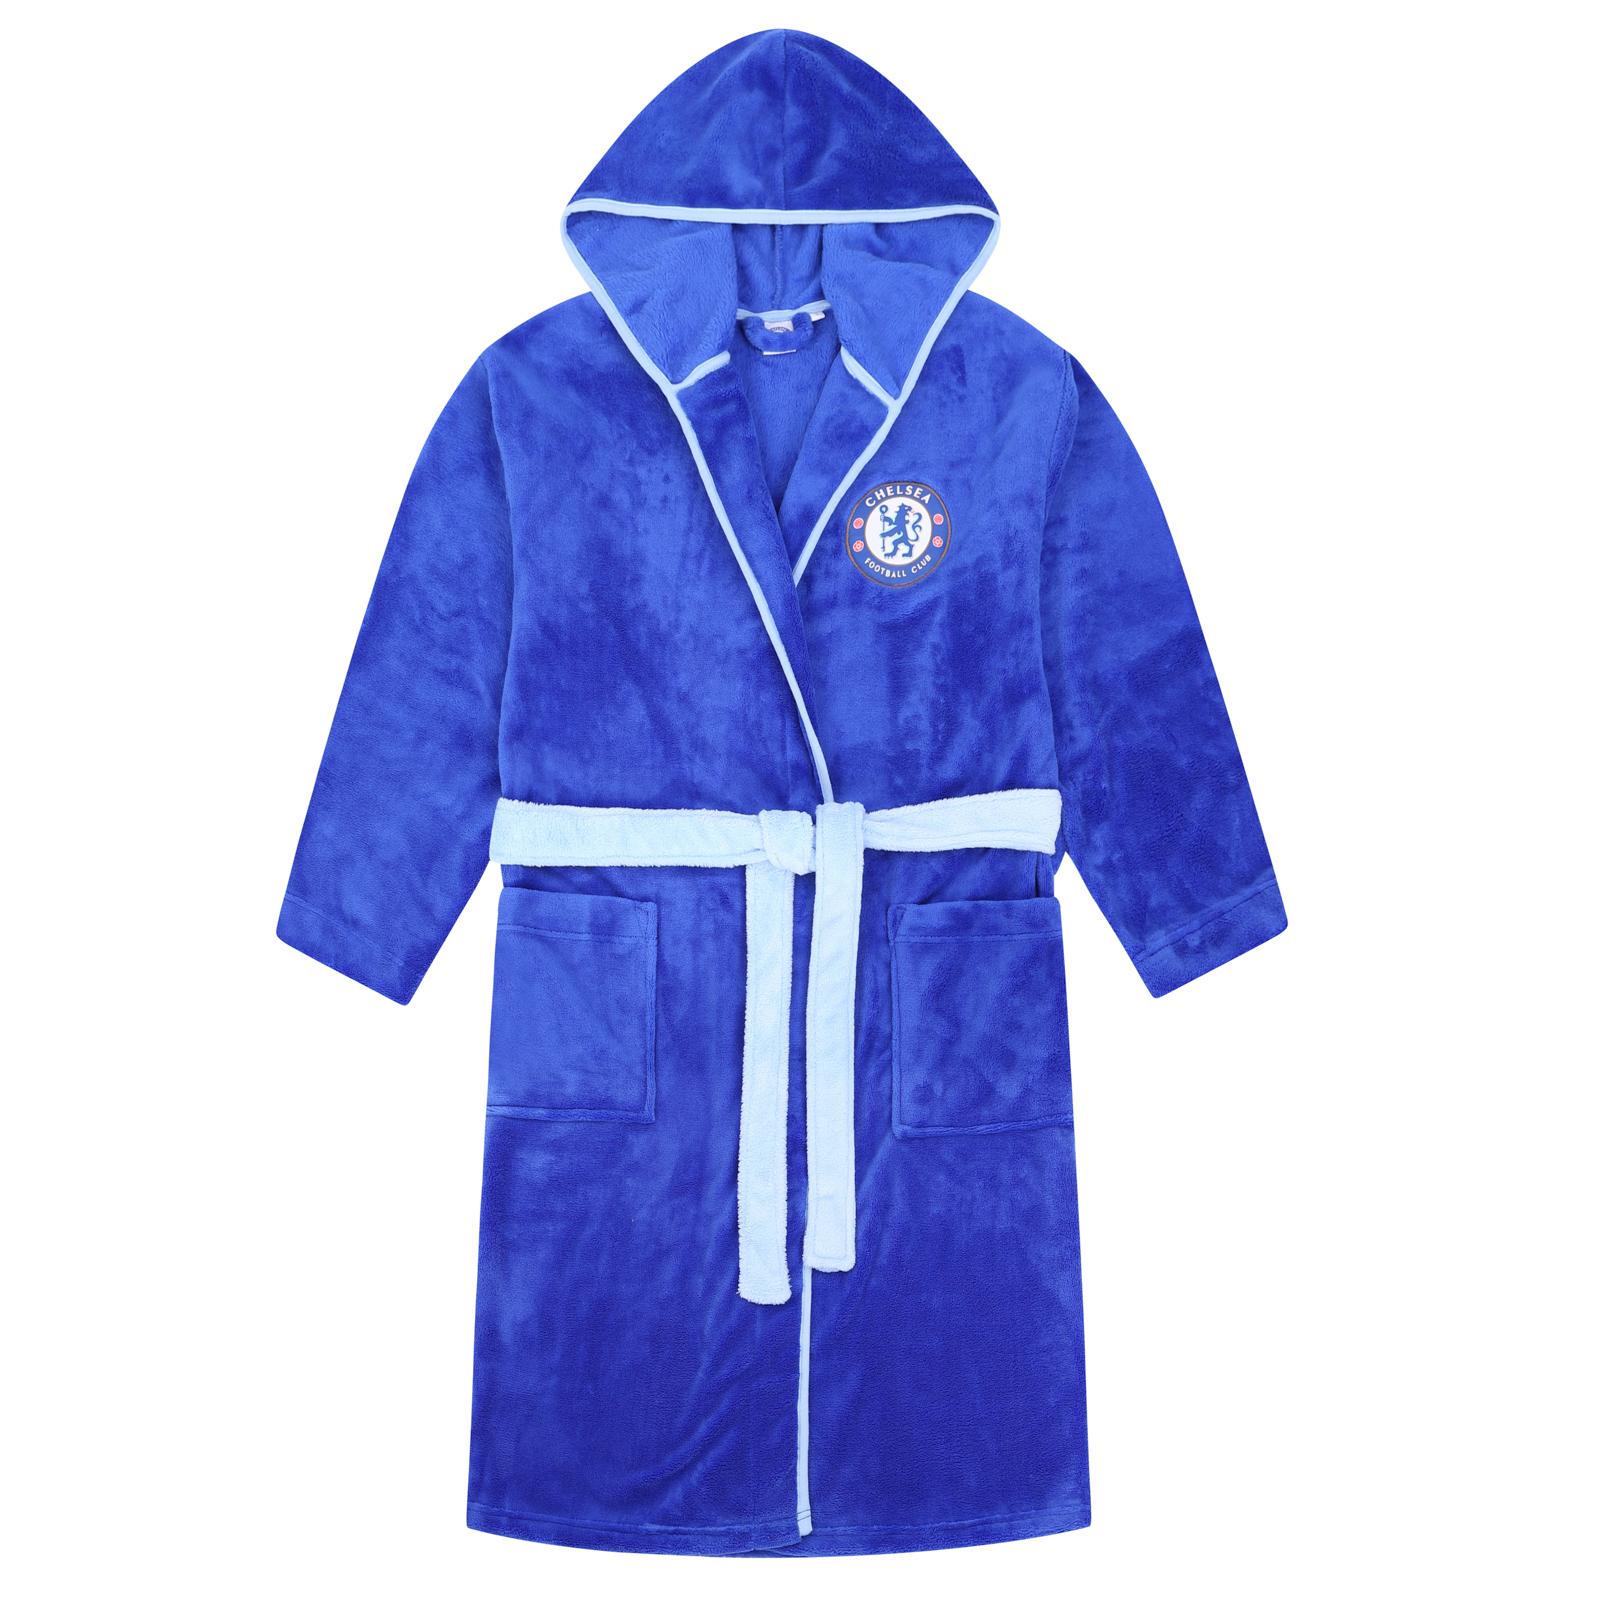 New Official Chelsea FC Soft Fleece Football Dressing Gown Bath Robe Nightwear Blue Mens